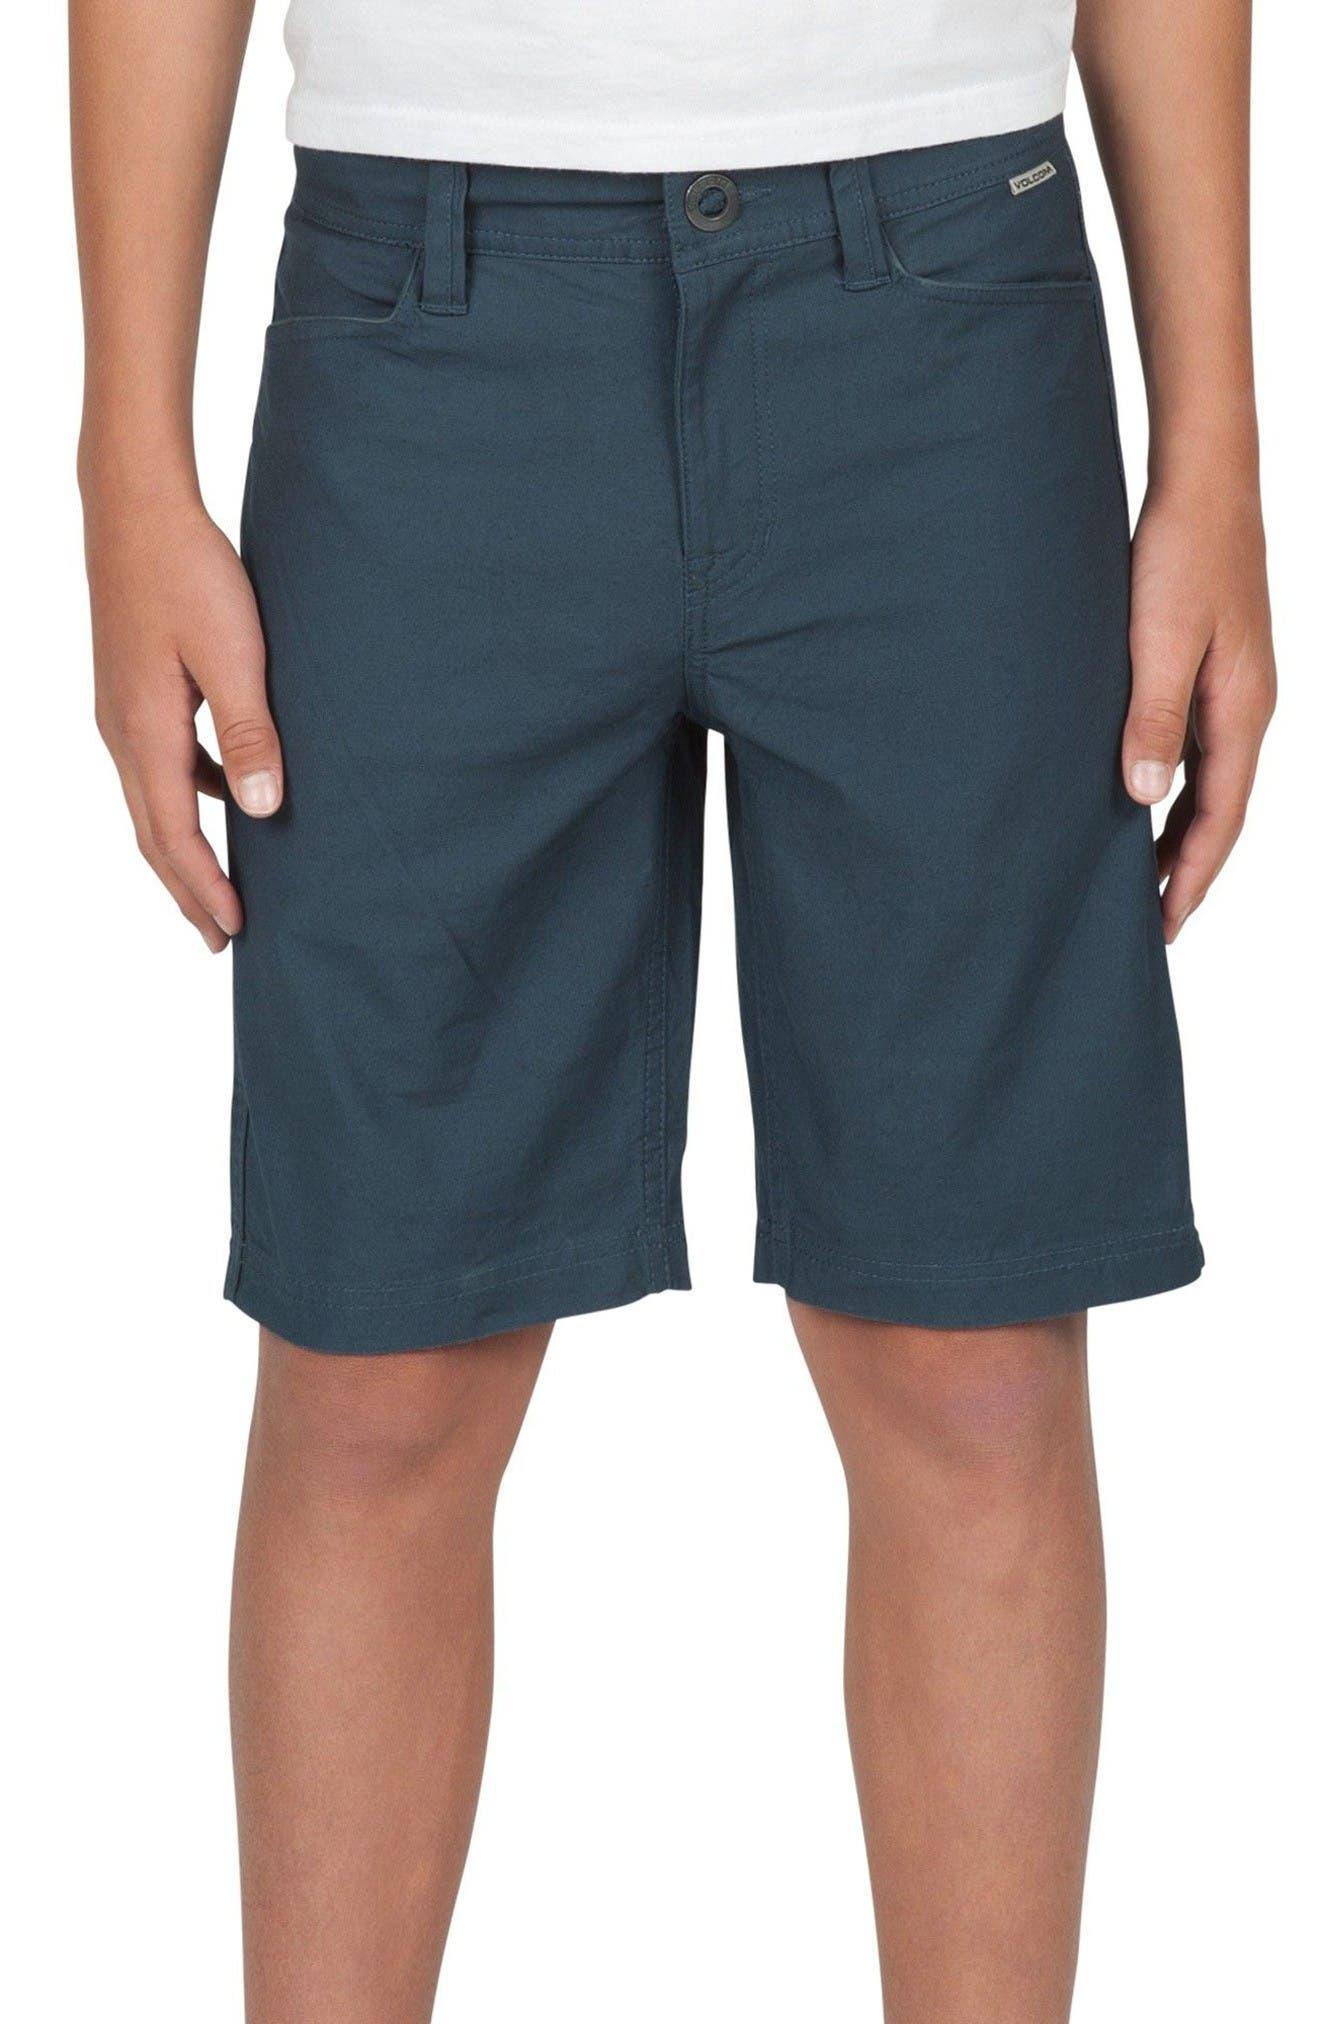 Main Image - Volcom VSM Gritter Chino Shorts (Big Boys)